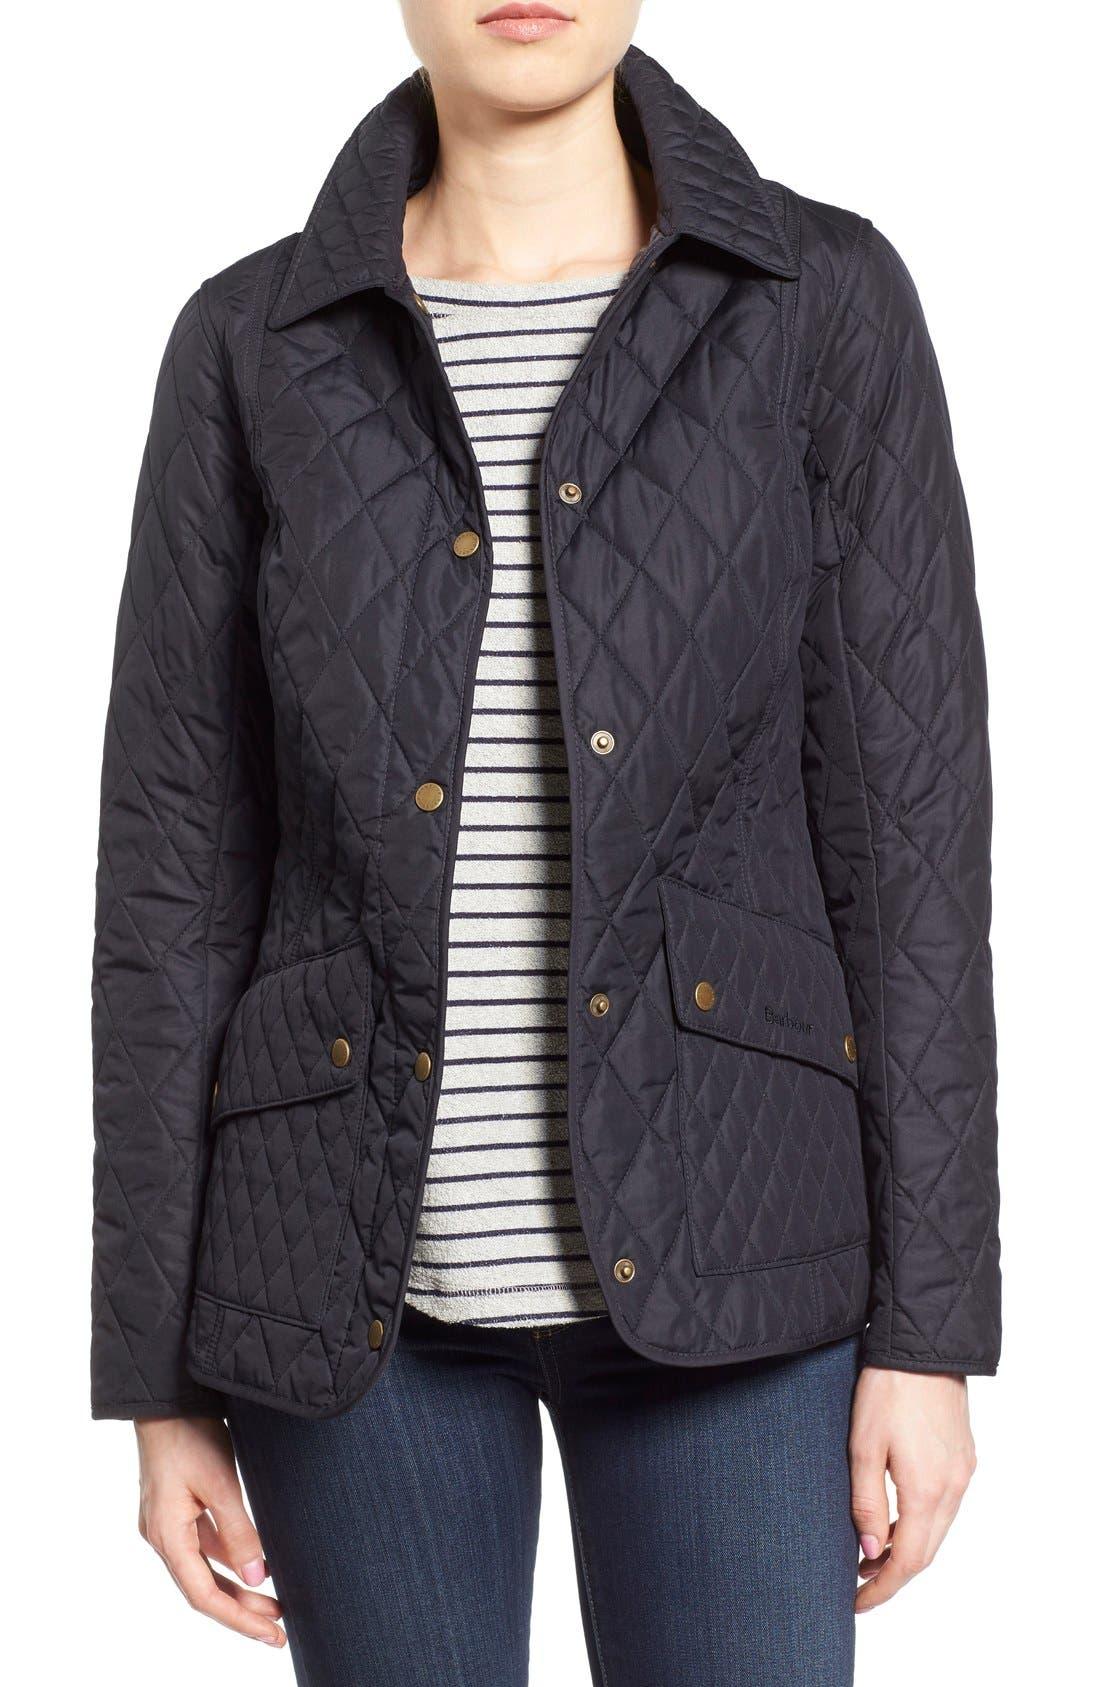 Alternate Image 1 Selected - Barbour 'Herterton' Lightweight Diamond Quilt Jacket